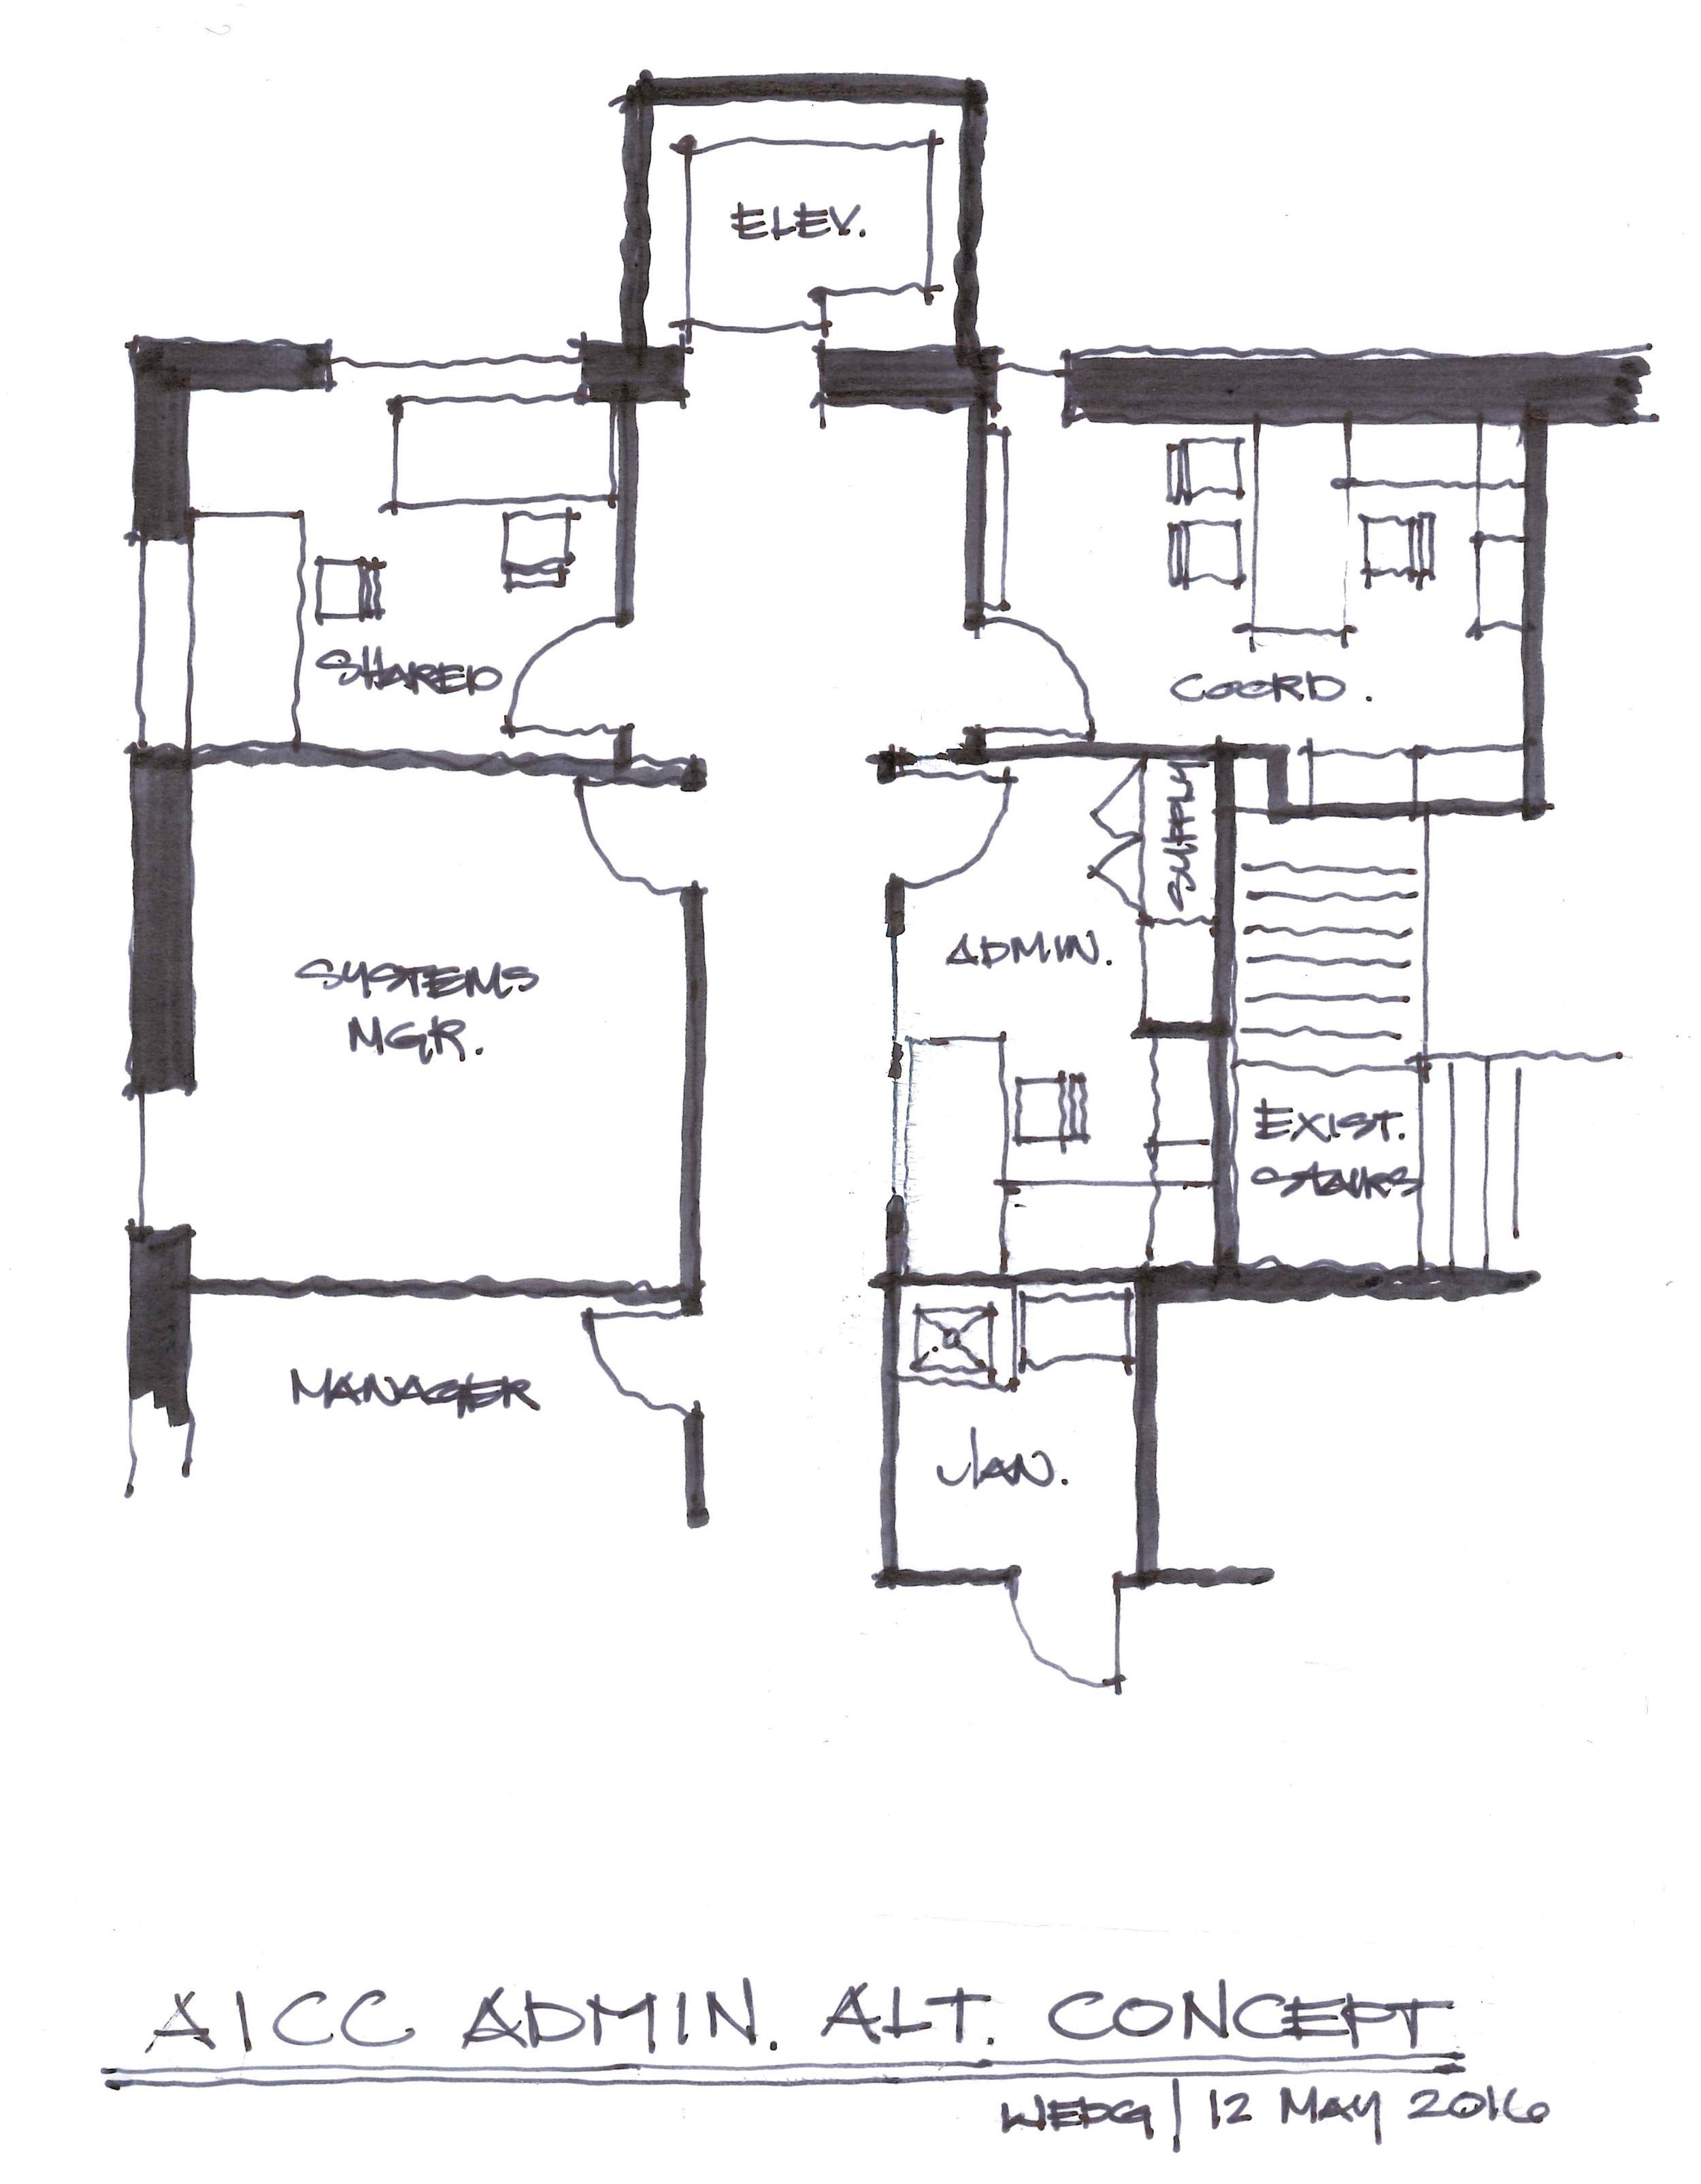 Airport Study Sketch 2.jpg